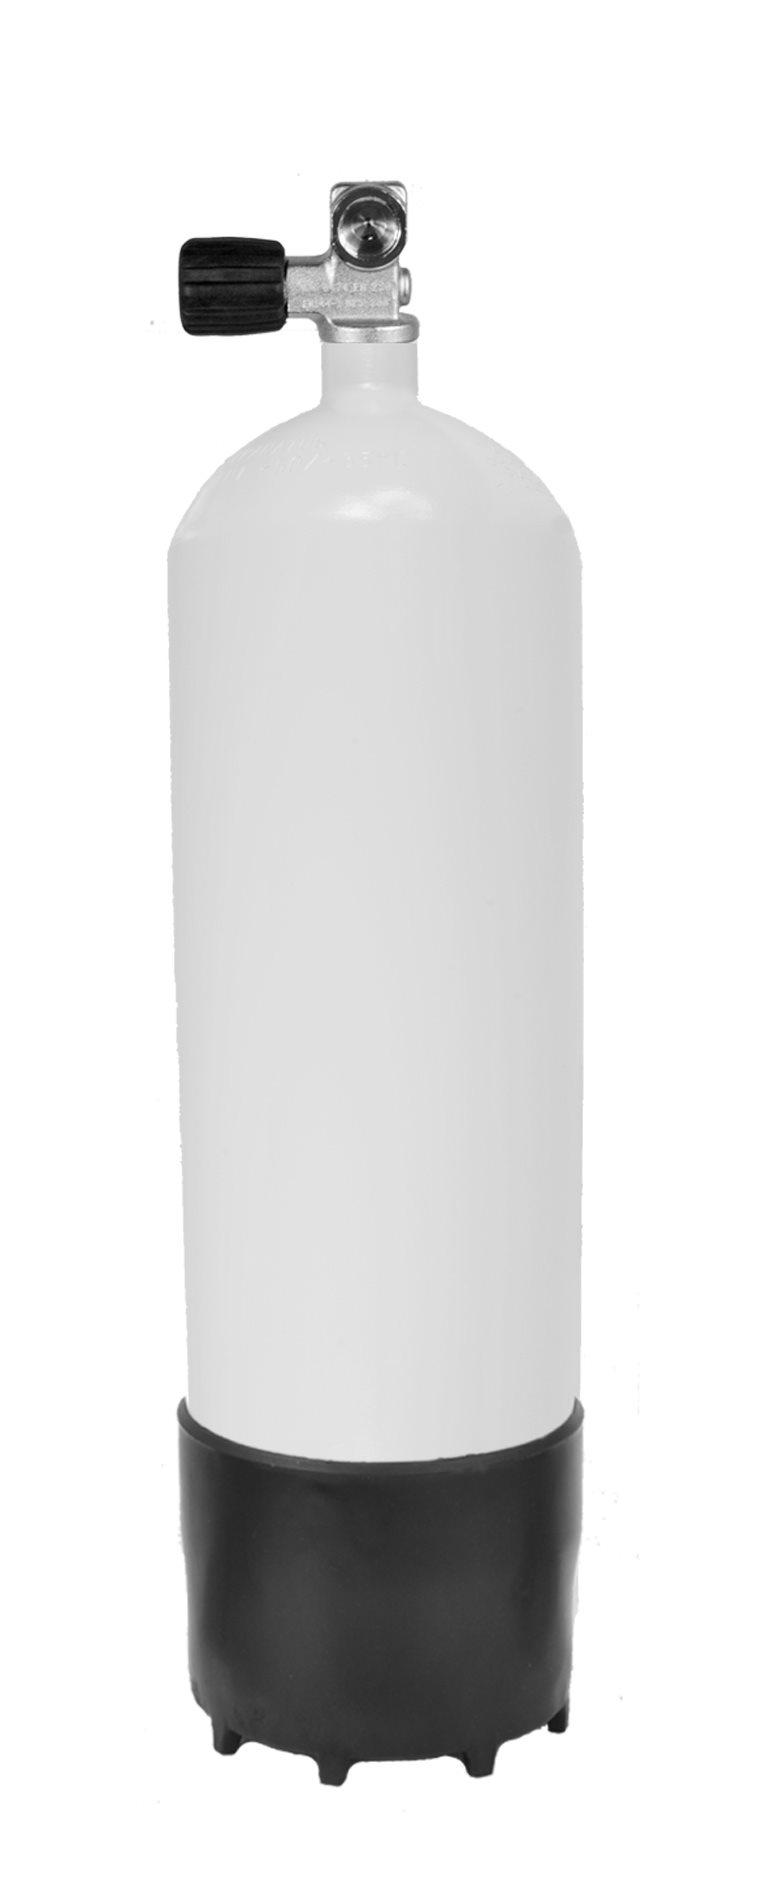 Водолазна бутилка 18 л / 232 бара - Eurocylinder